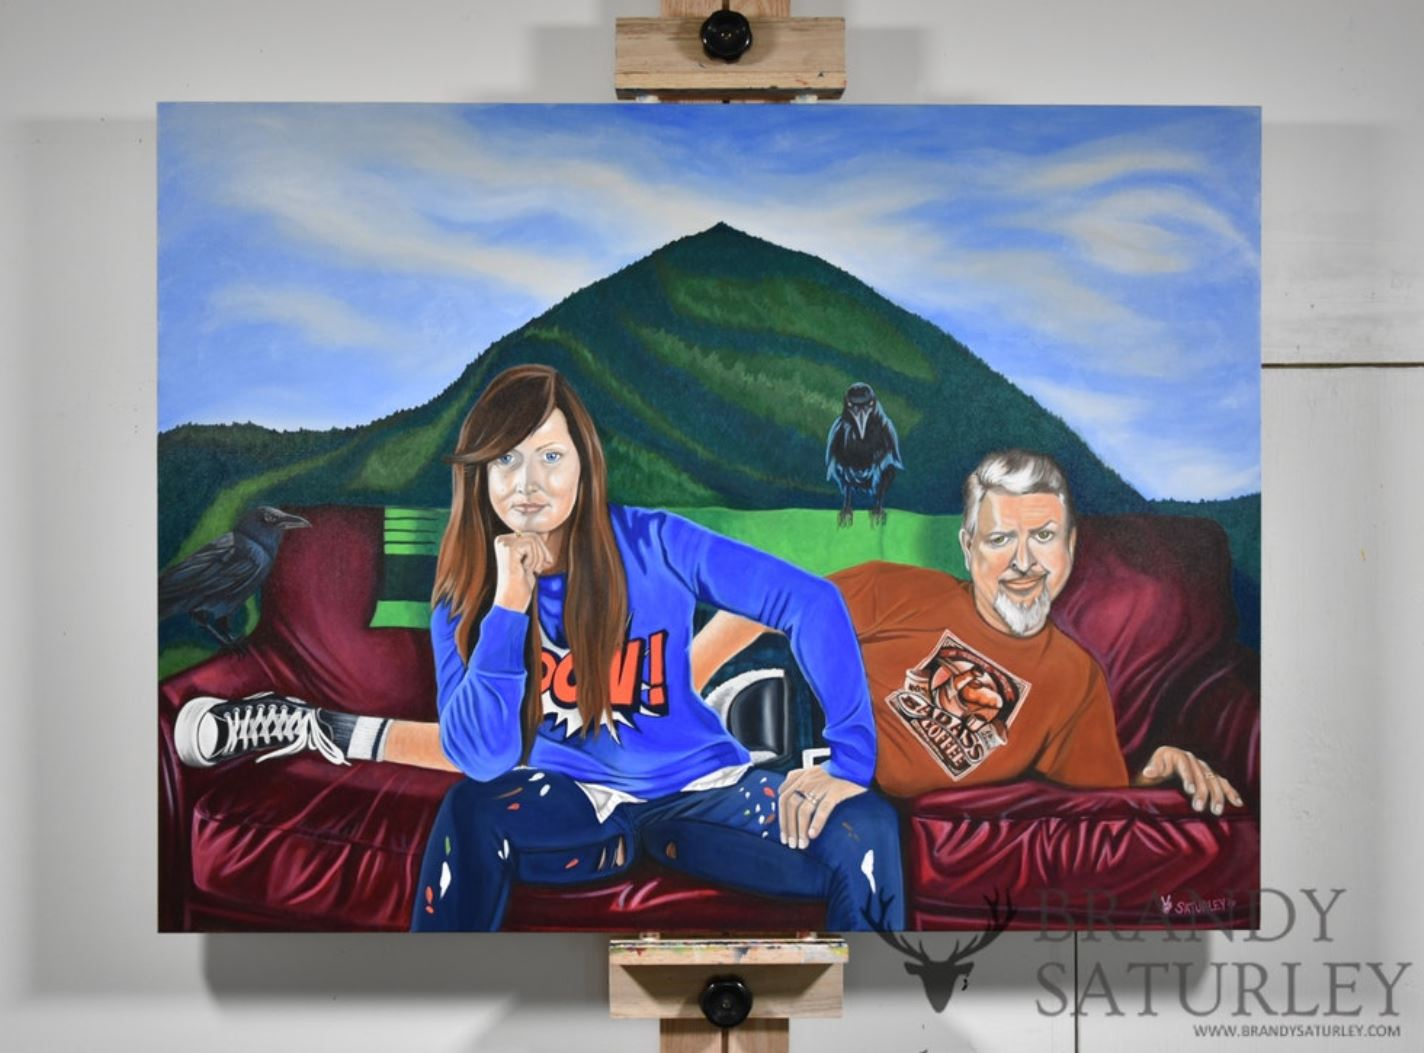 Brandy Saturley Canadian artist